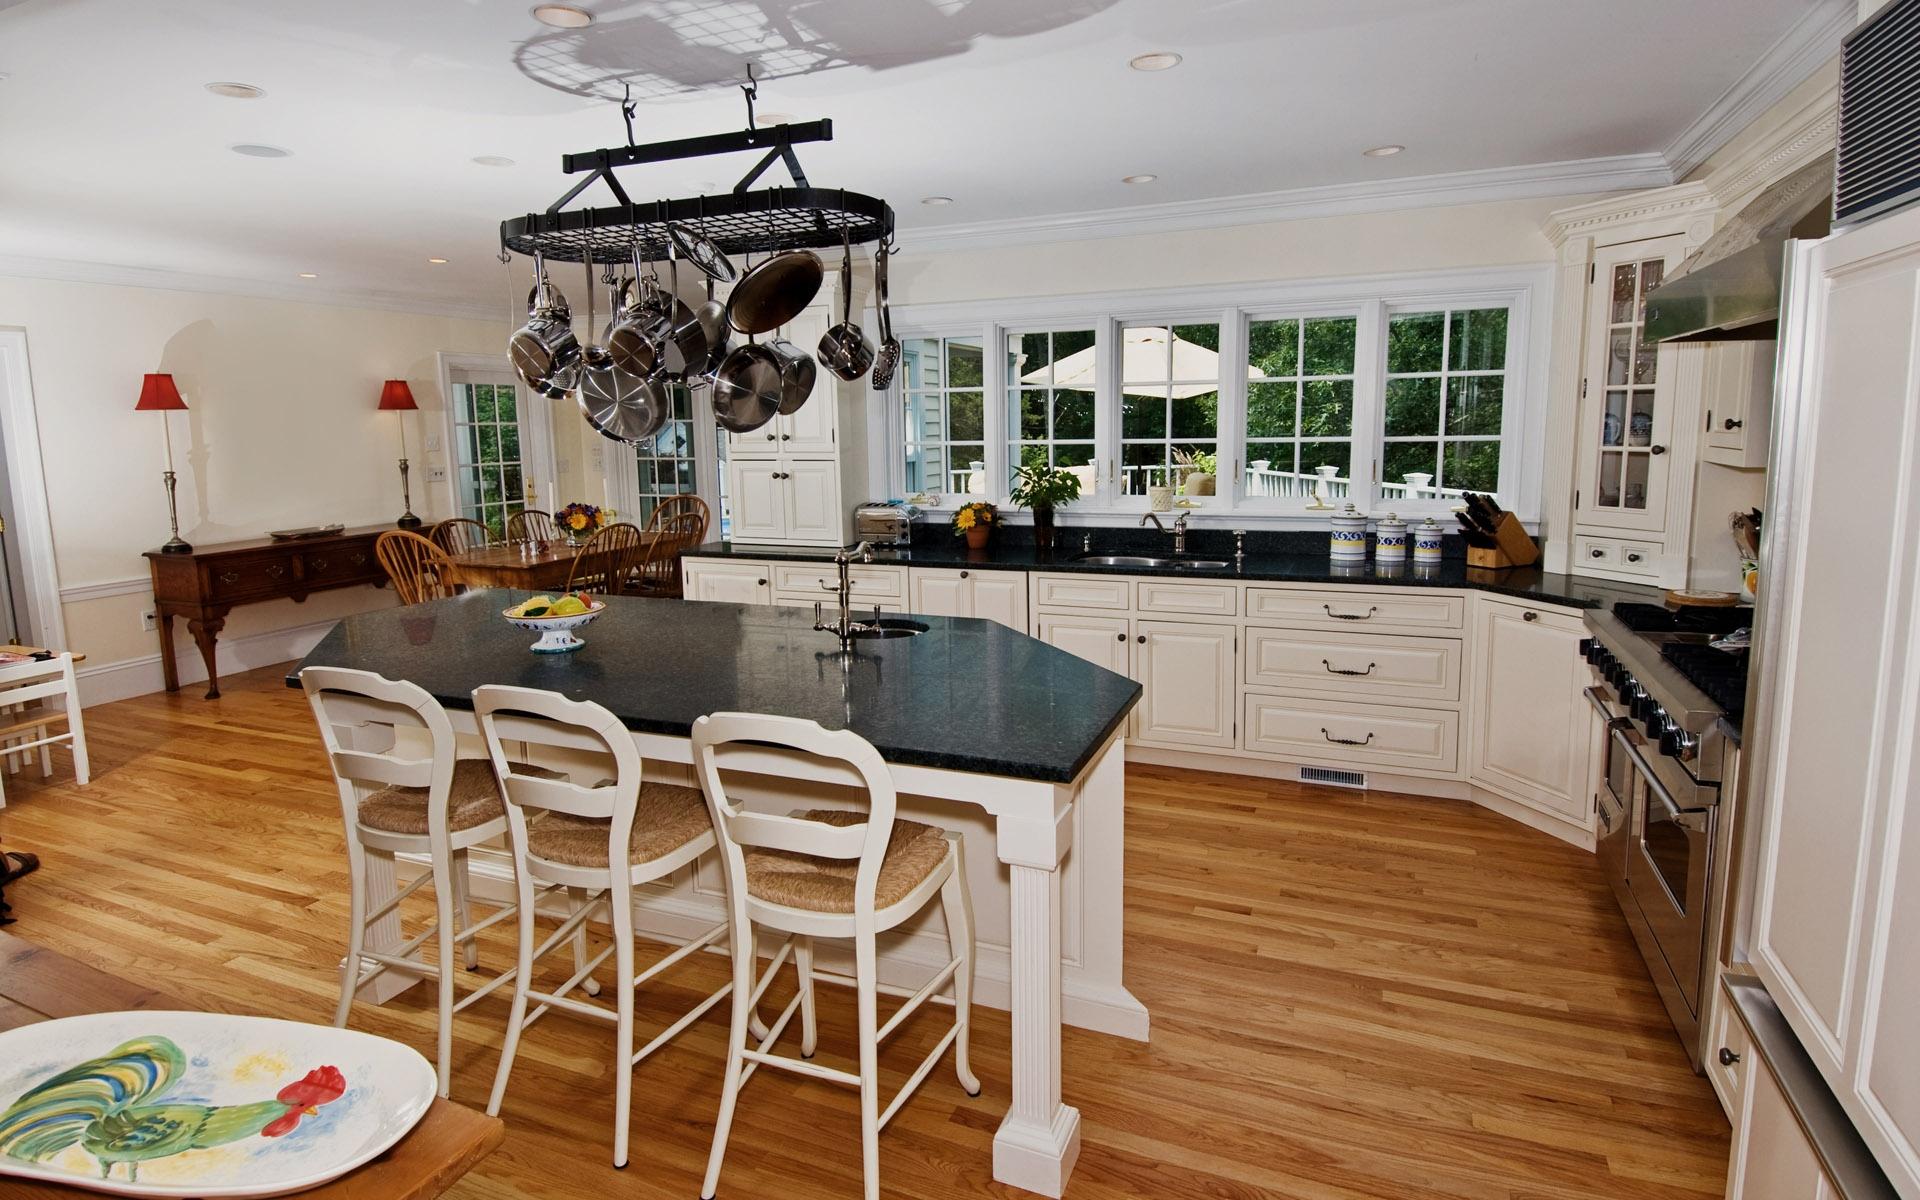 Fondos de pantalla : habitación, interior, mesa, cocina, diseño de ...